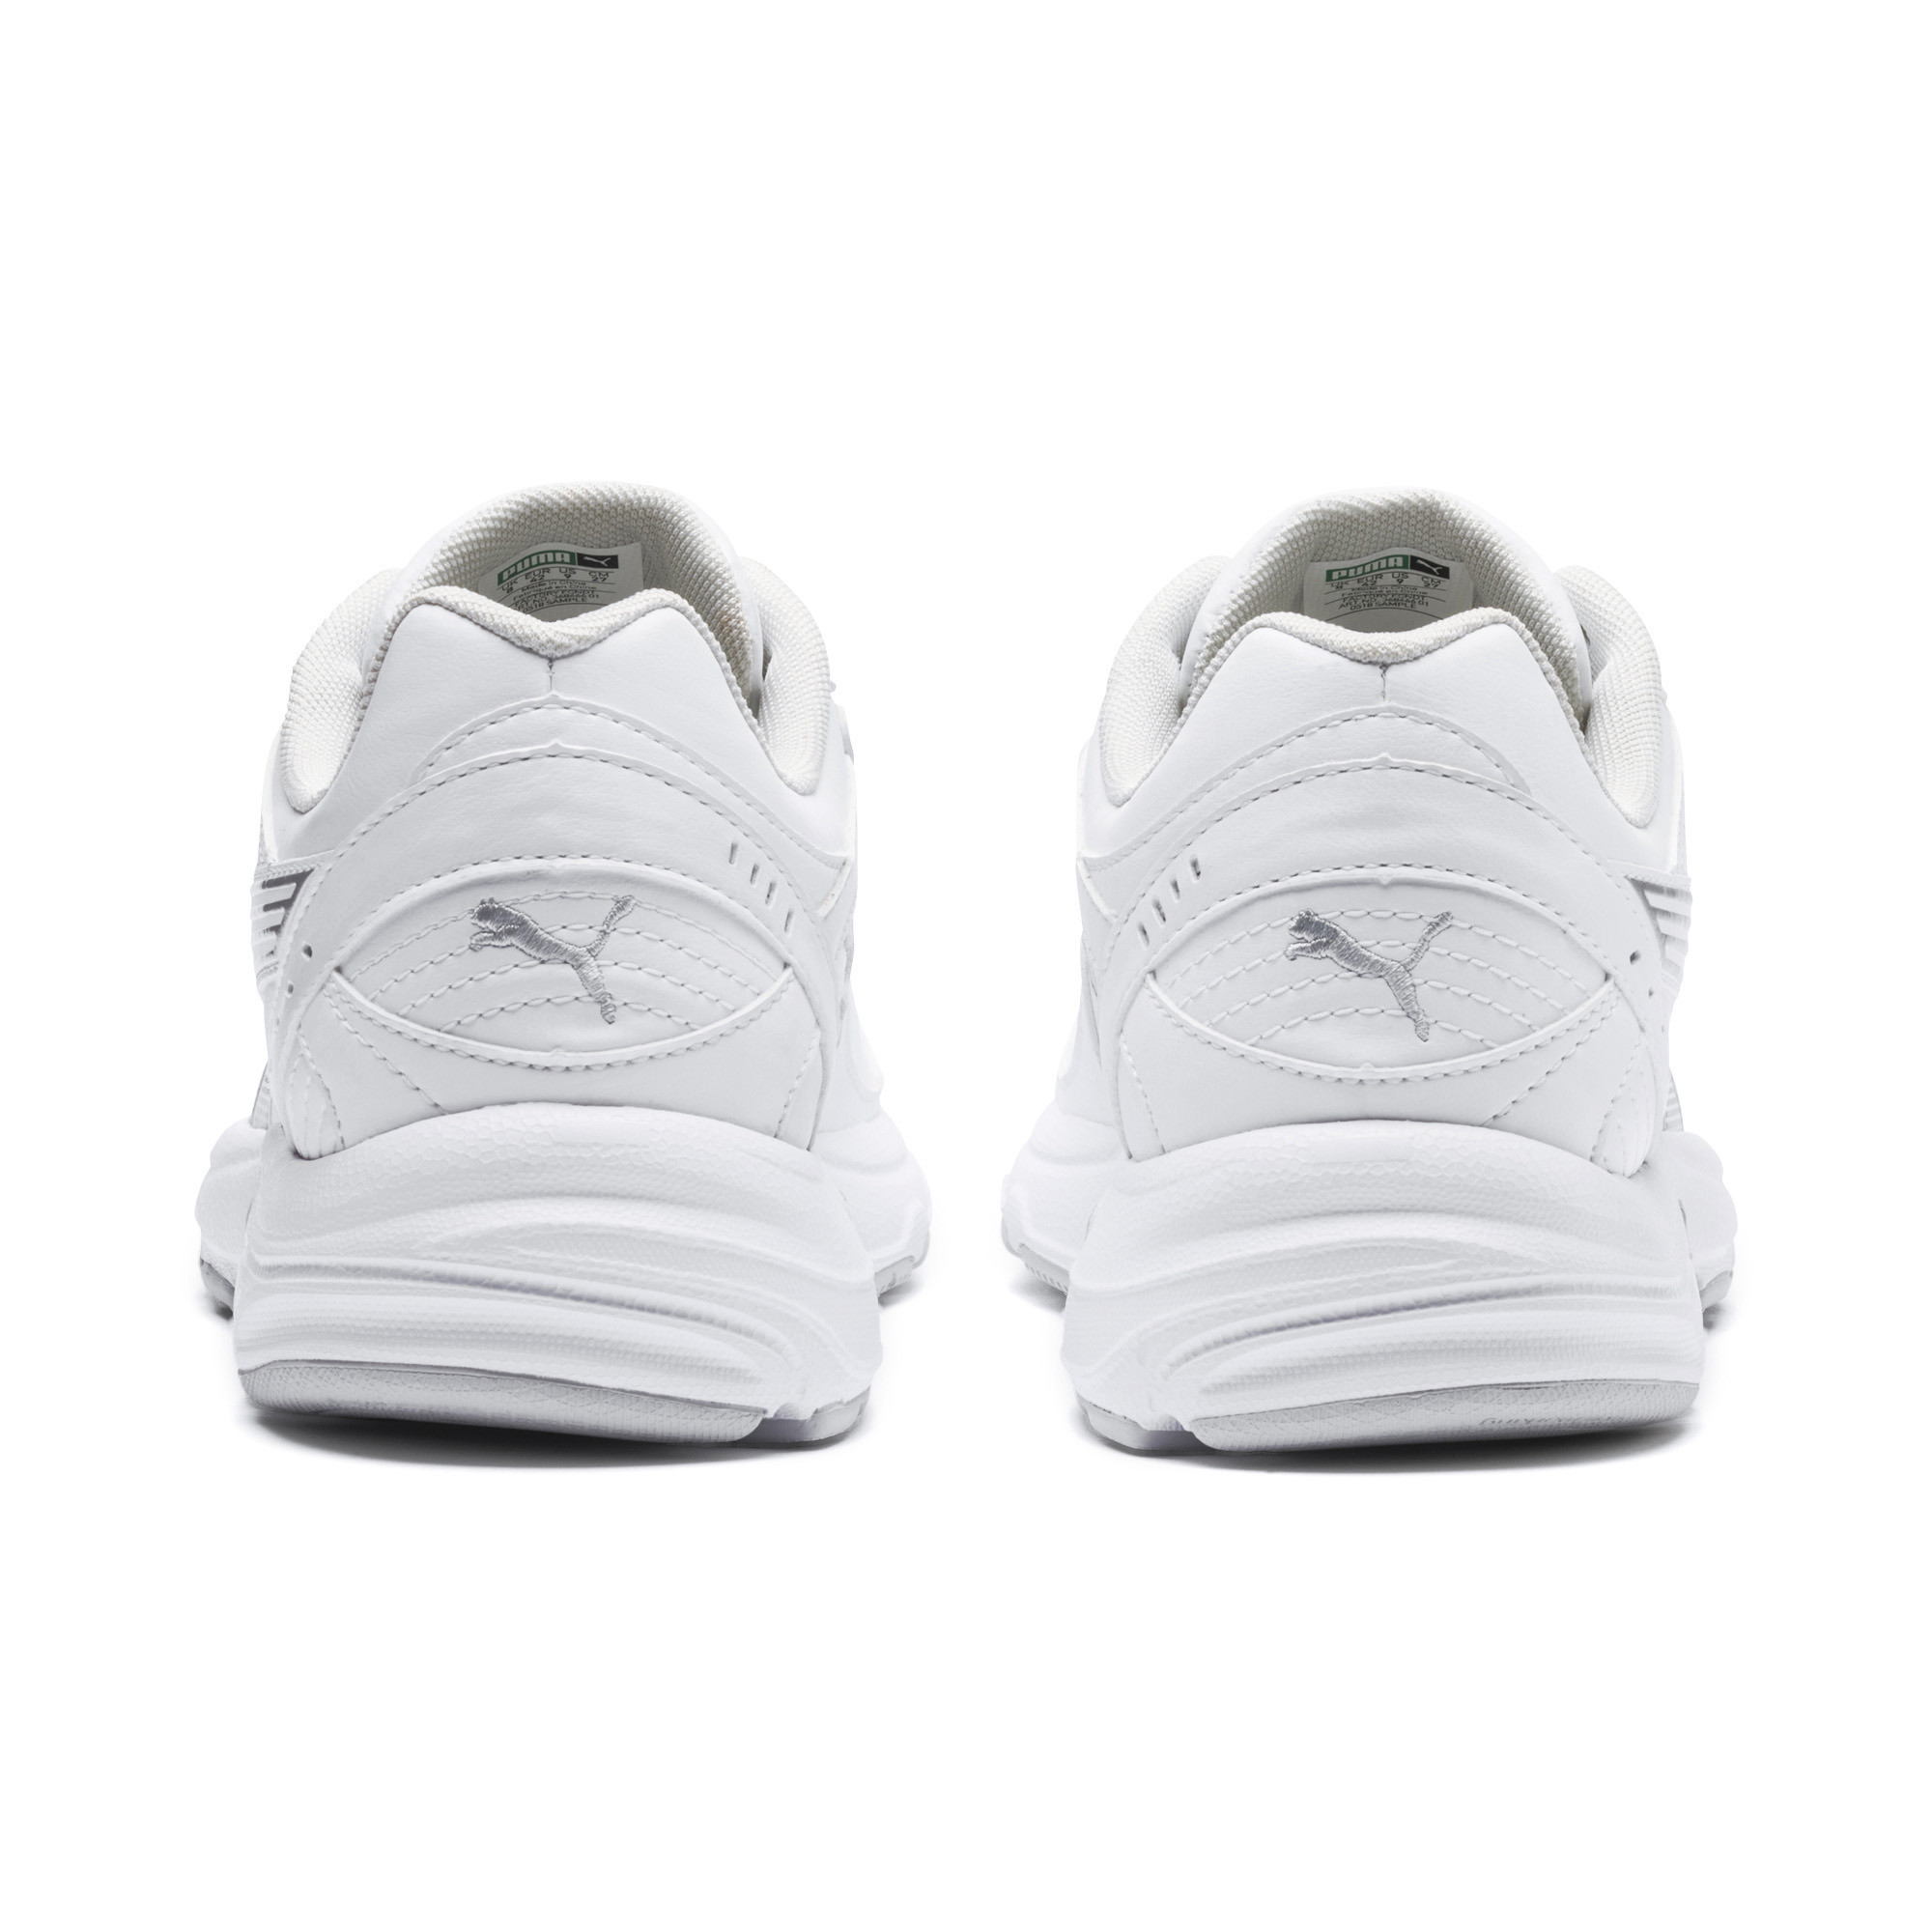 PUMA-Men-039-s-Axis-SL-Sneakers thumbnail 3